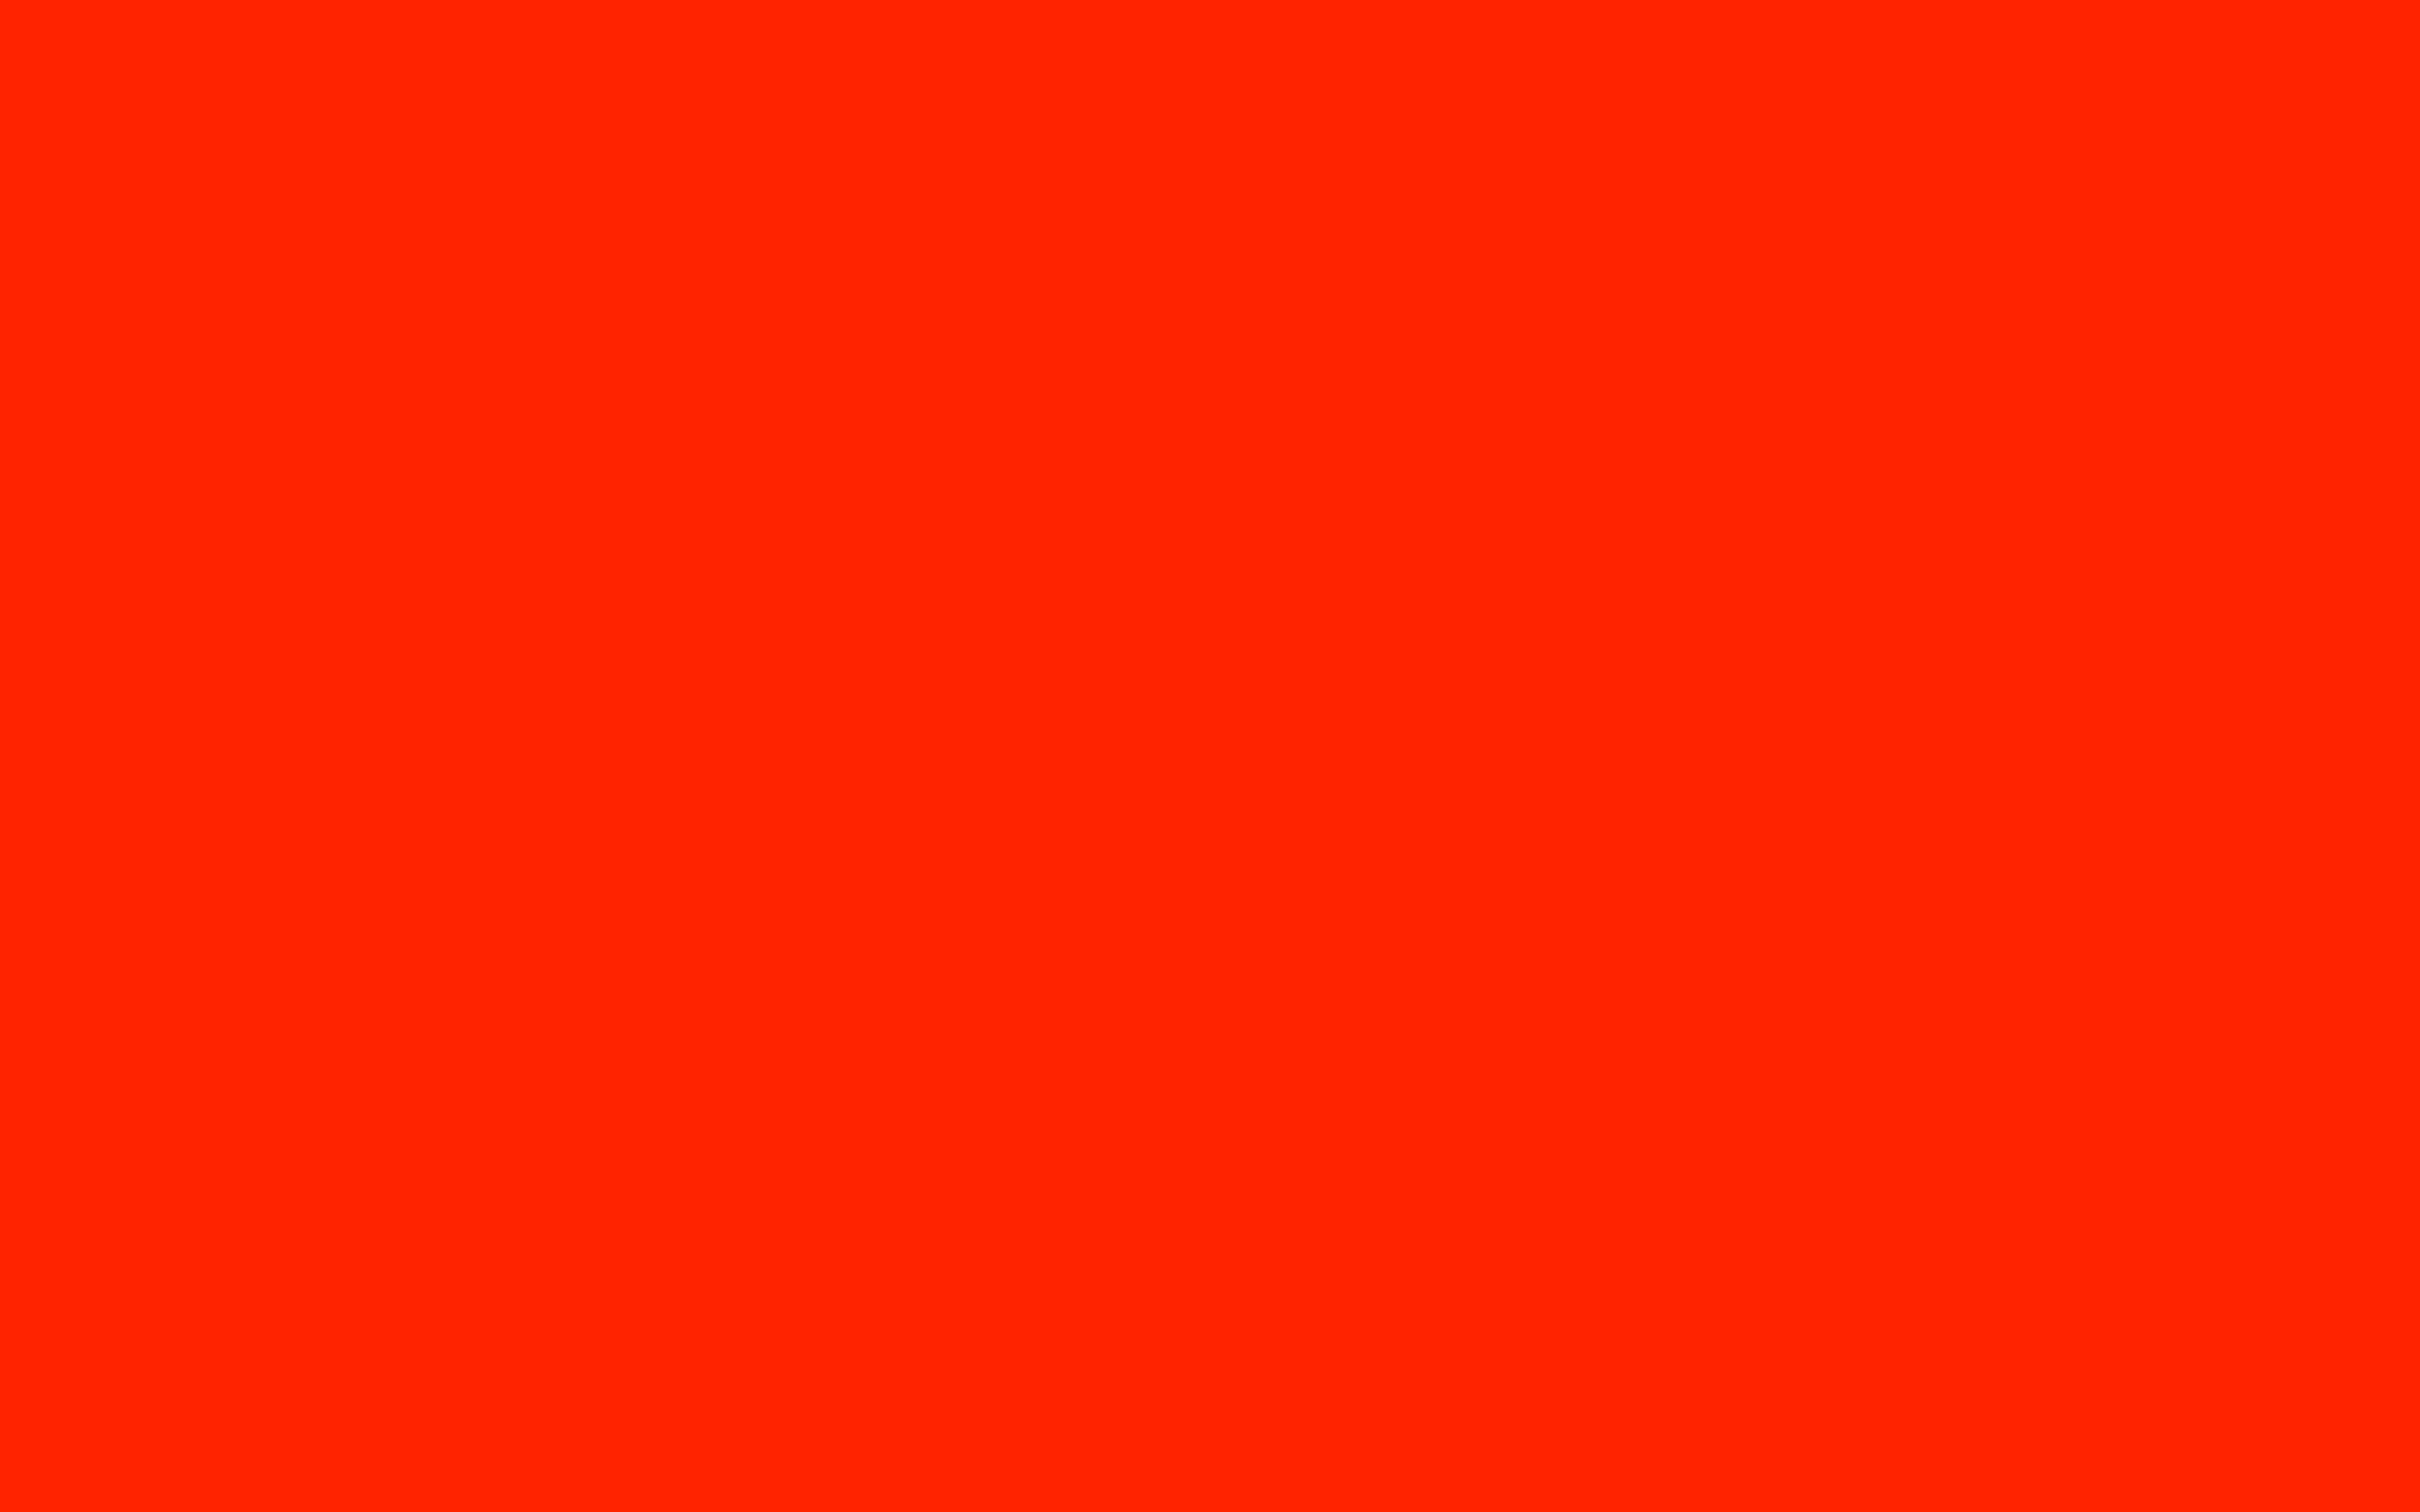 2560x1600 Scarlet Solid Color Background